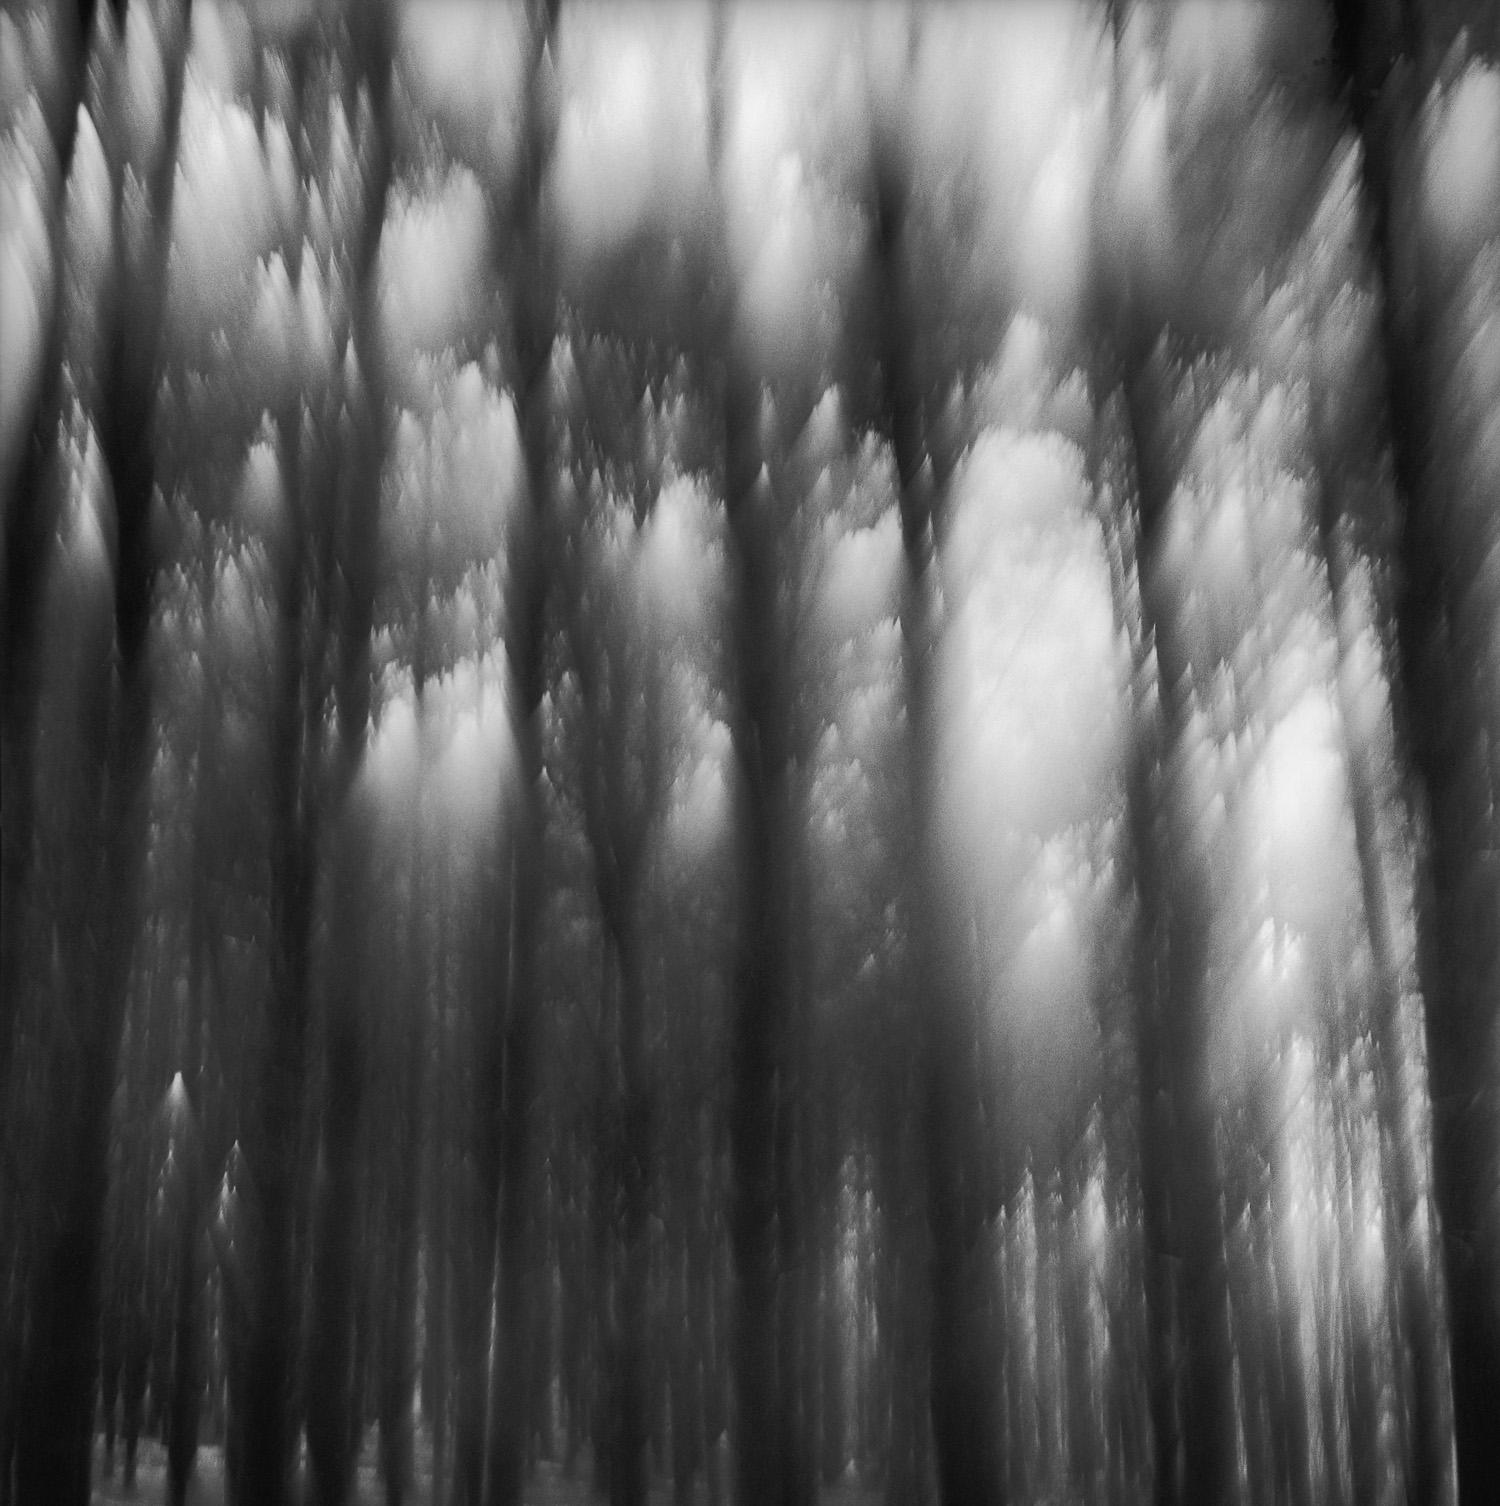 FANTASY FOREST TOPS, web.jpg